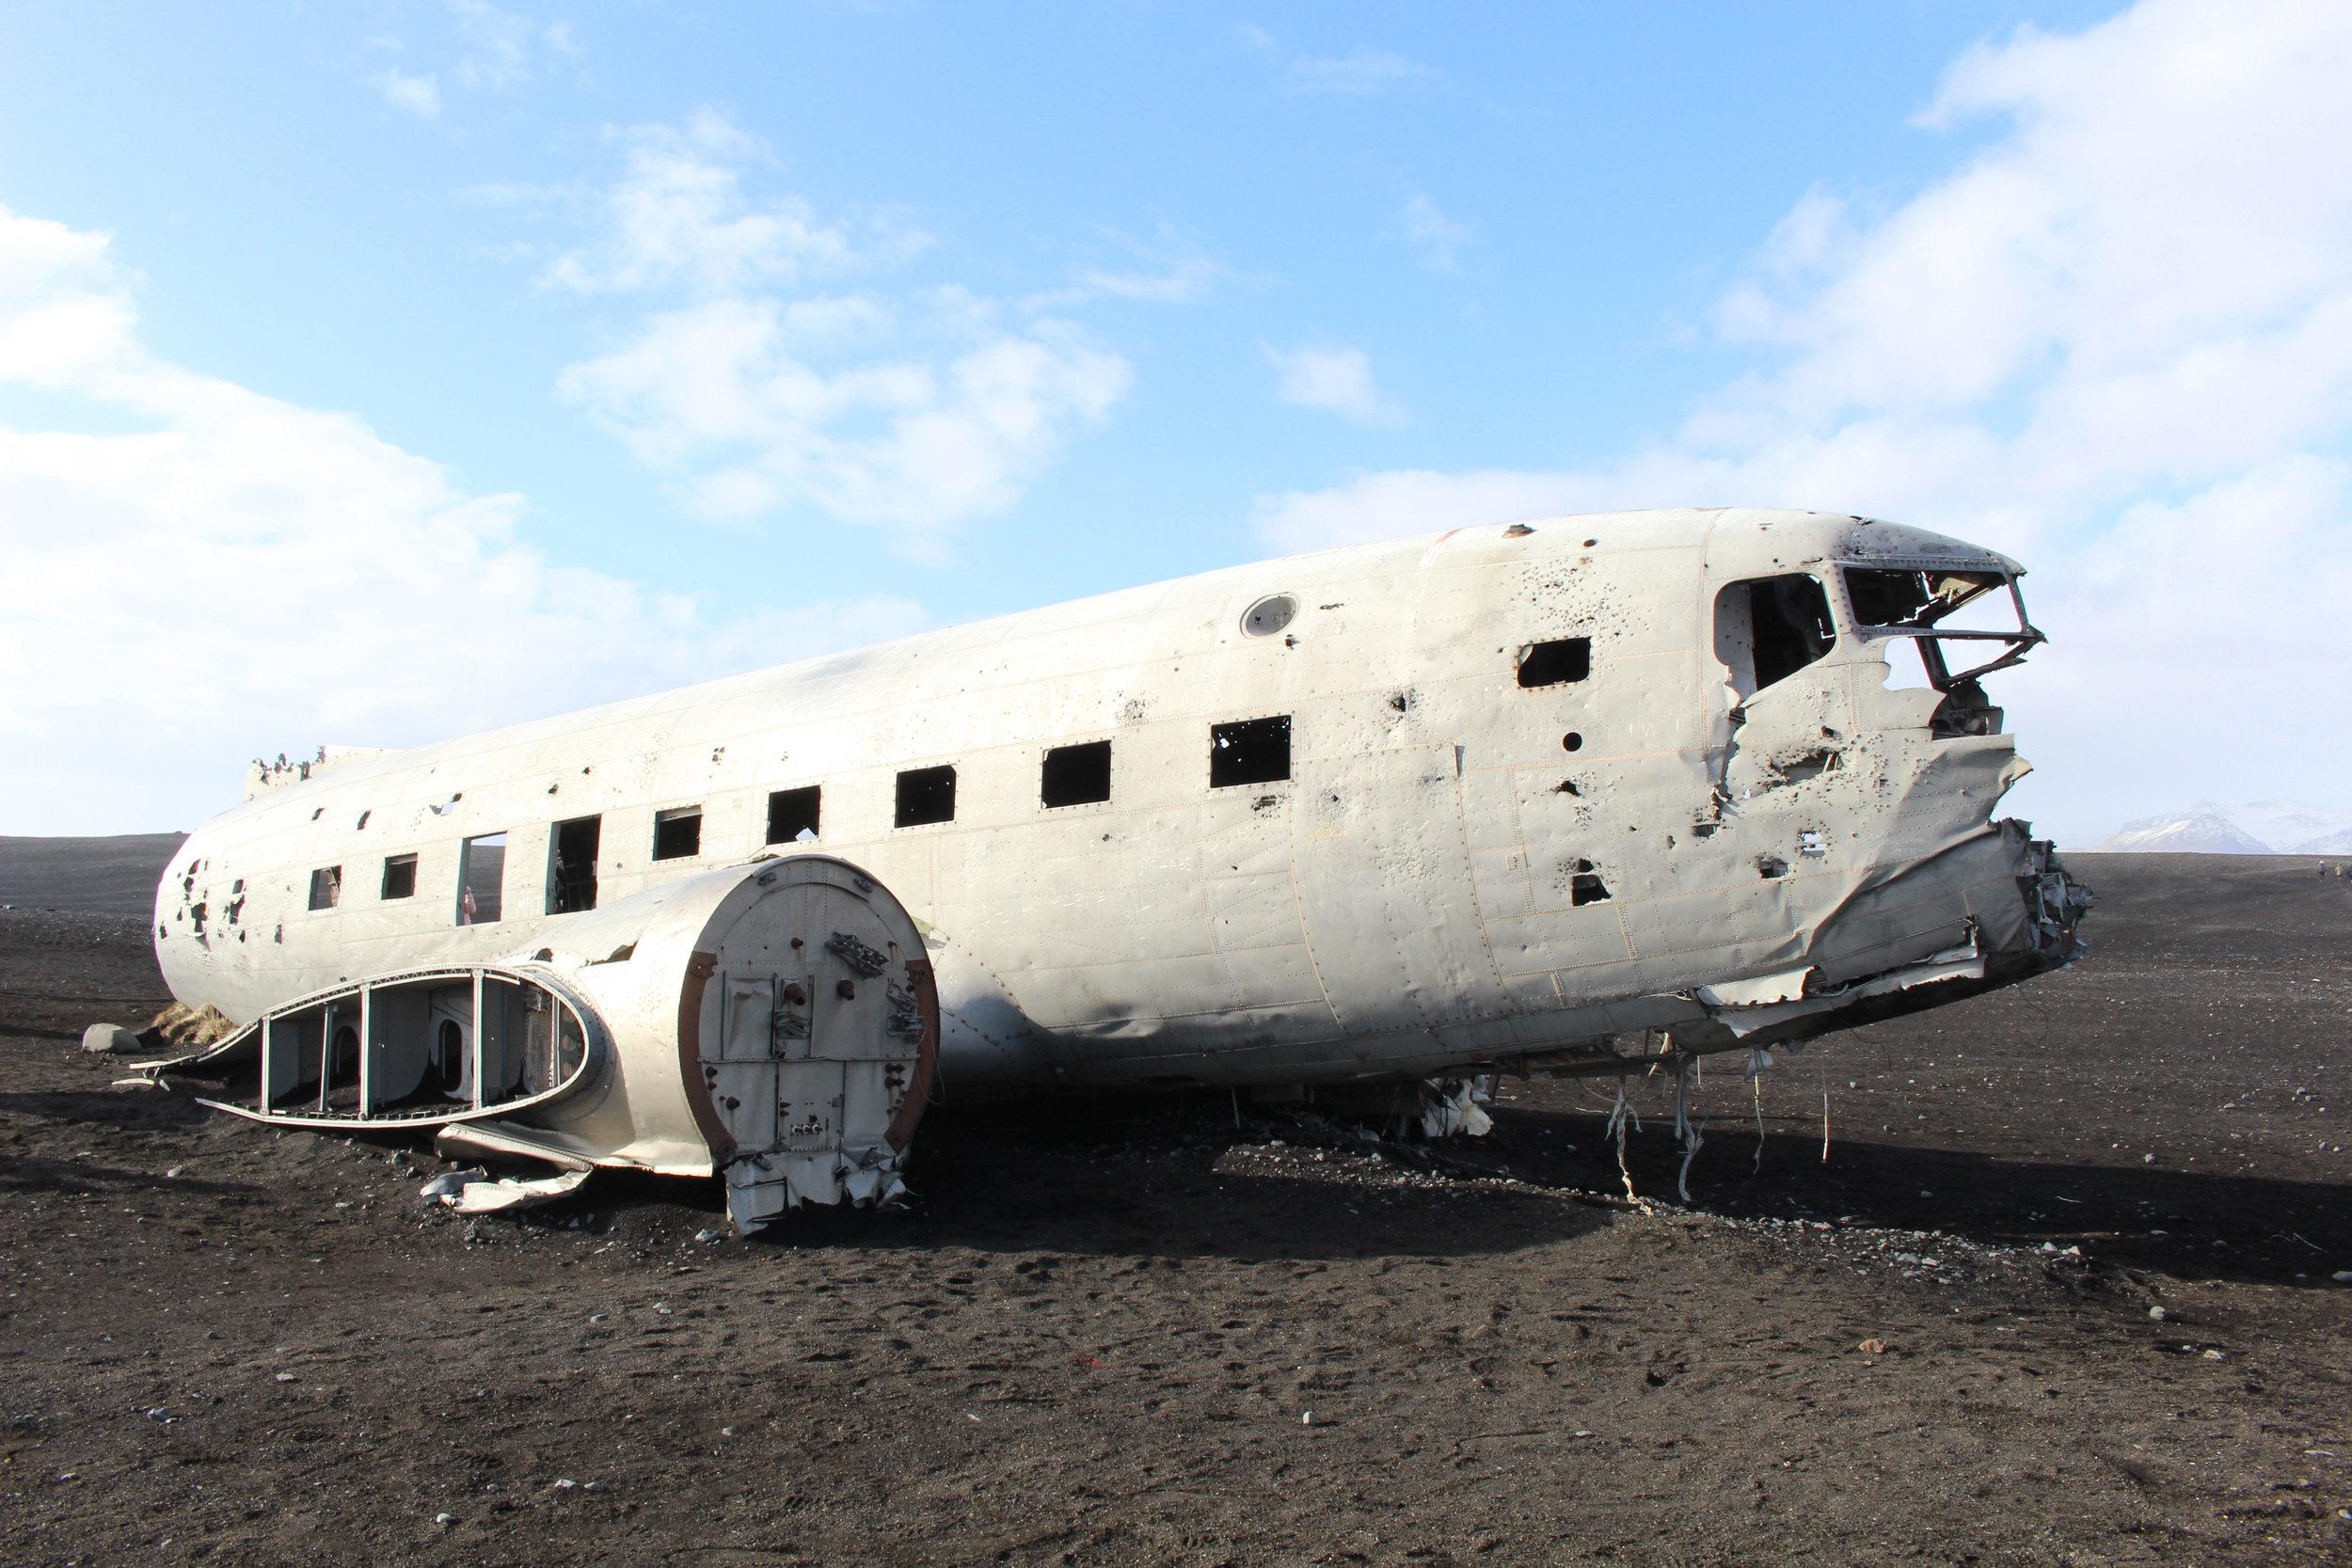 Sólheimasandur Plane Crash (1973 US Navy airplane)